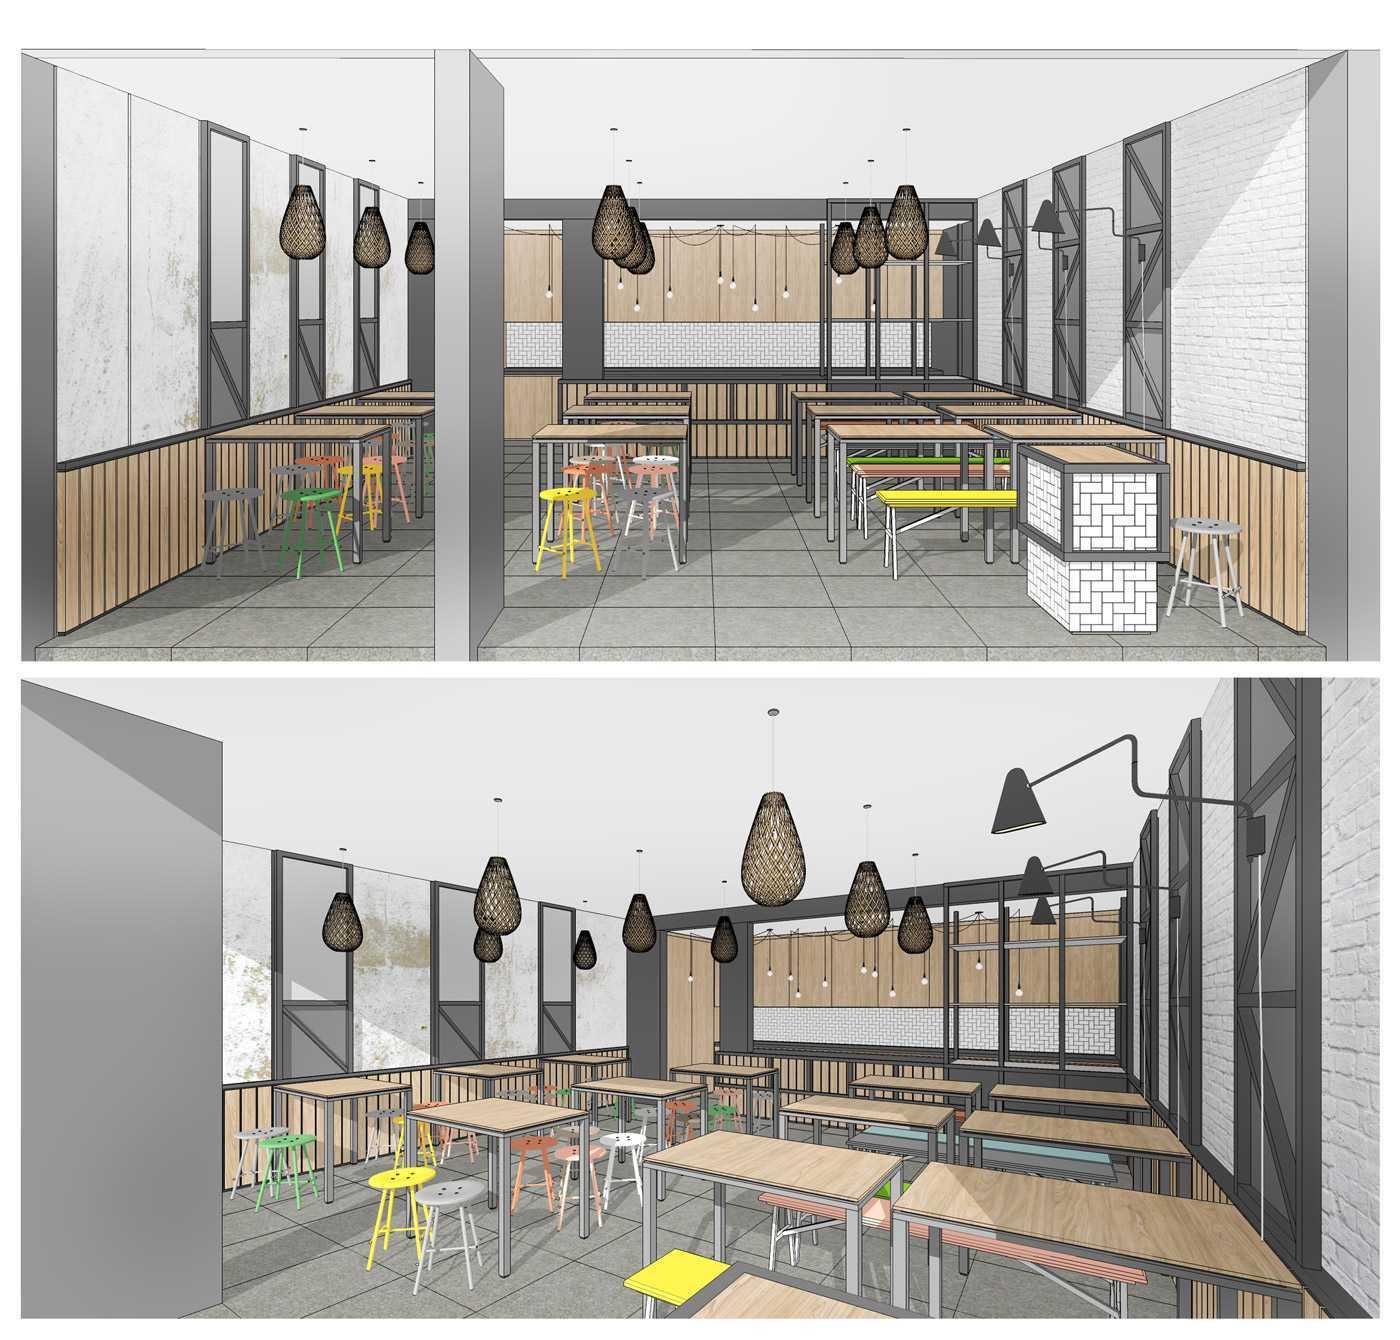 Fabdesain S_Cafe Jakarta, Daerah Khusus Ibukota Jakarta, Indonesia Jakarta, Daerah Khusus Ibukota Jakarta, Indonesia Interior Details Modern 40514